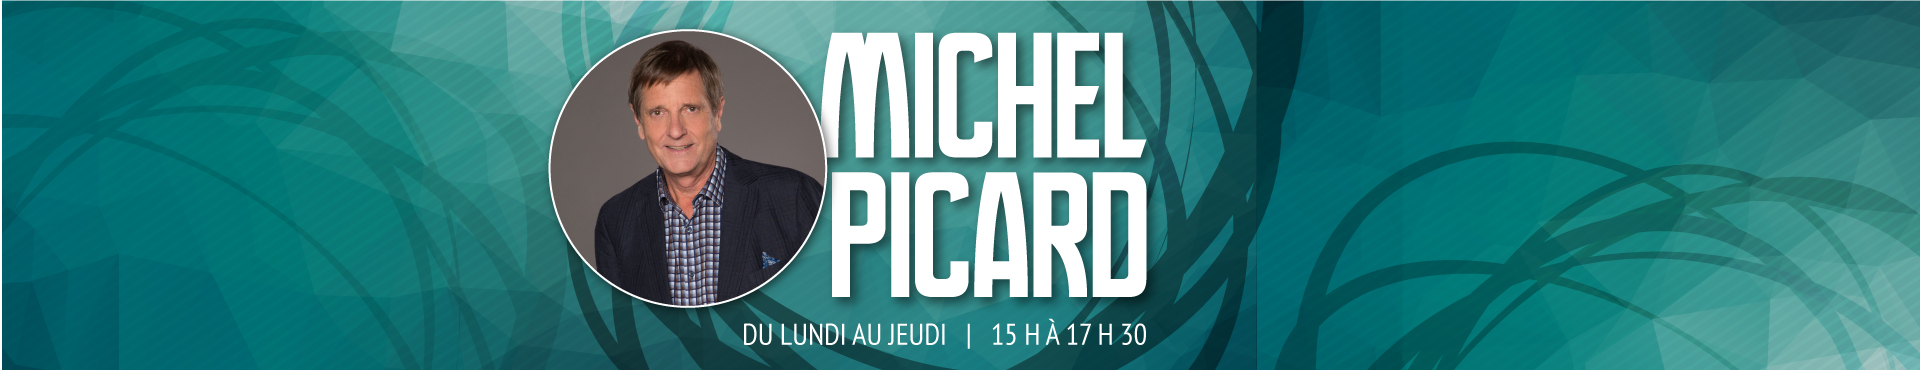 Michel Picard